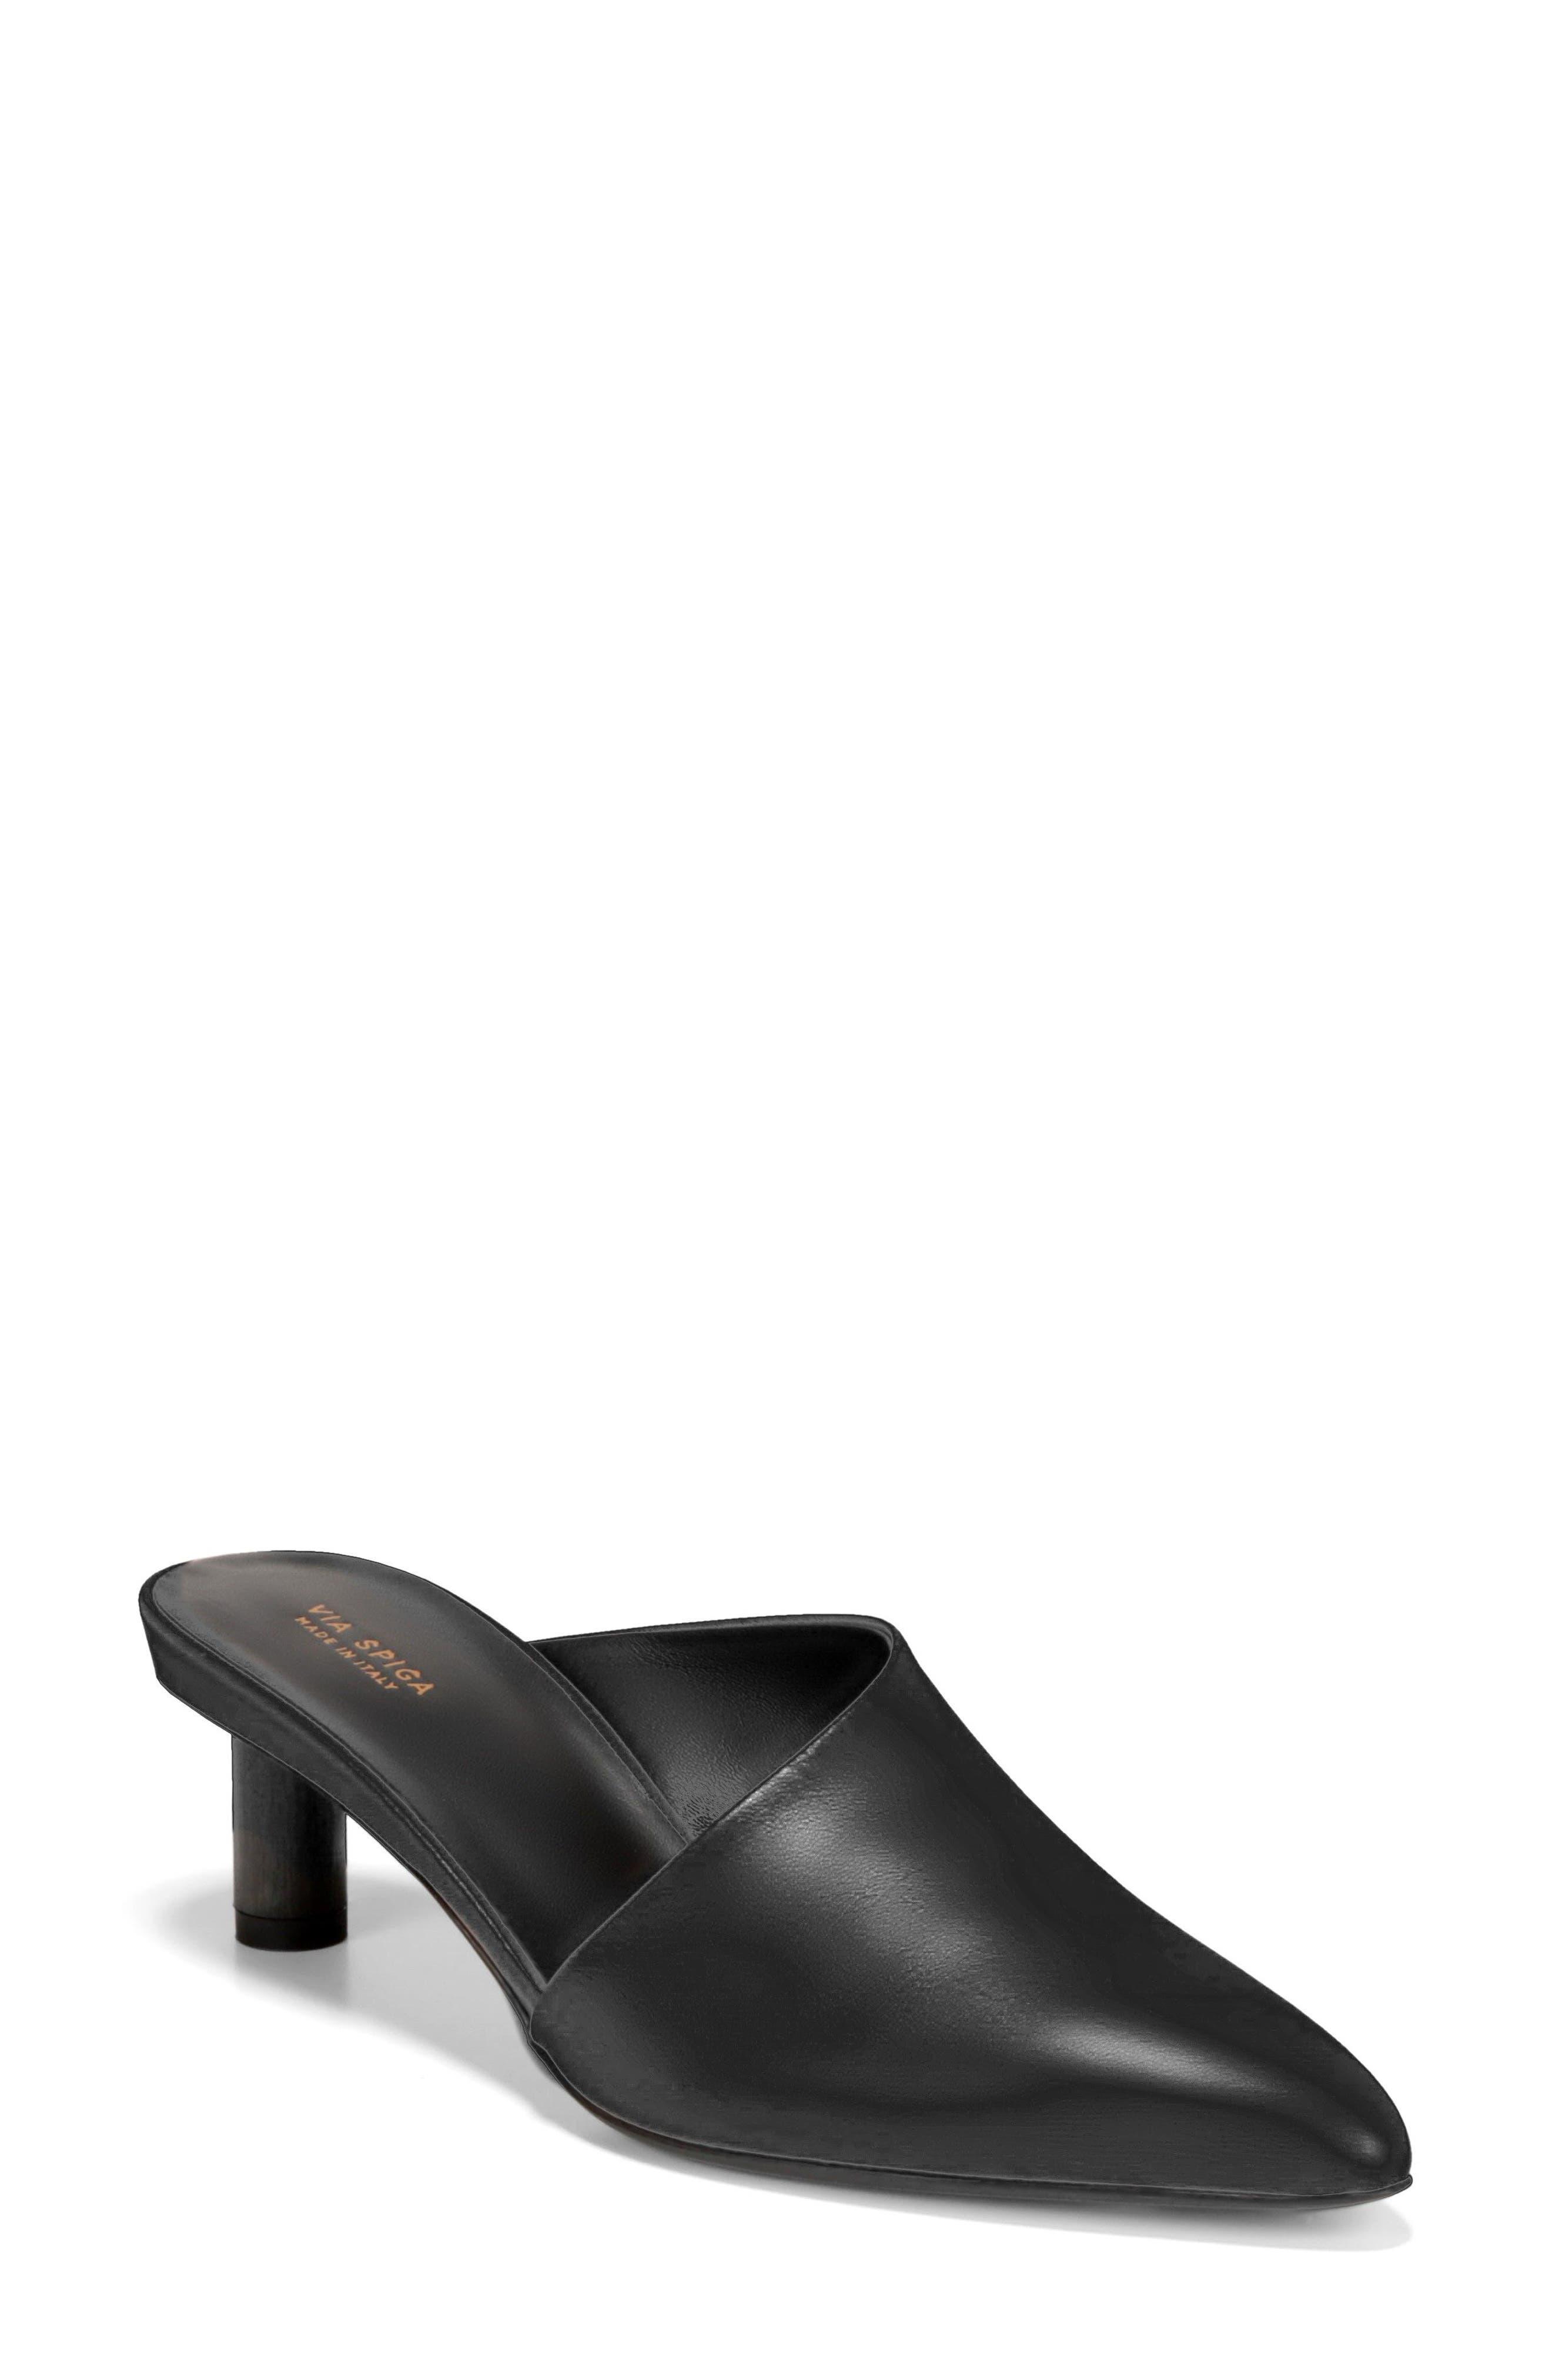 Freya Asymmetrical Mule,                         Main,                         color, BLACK LEATHER